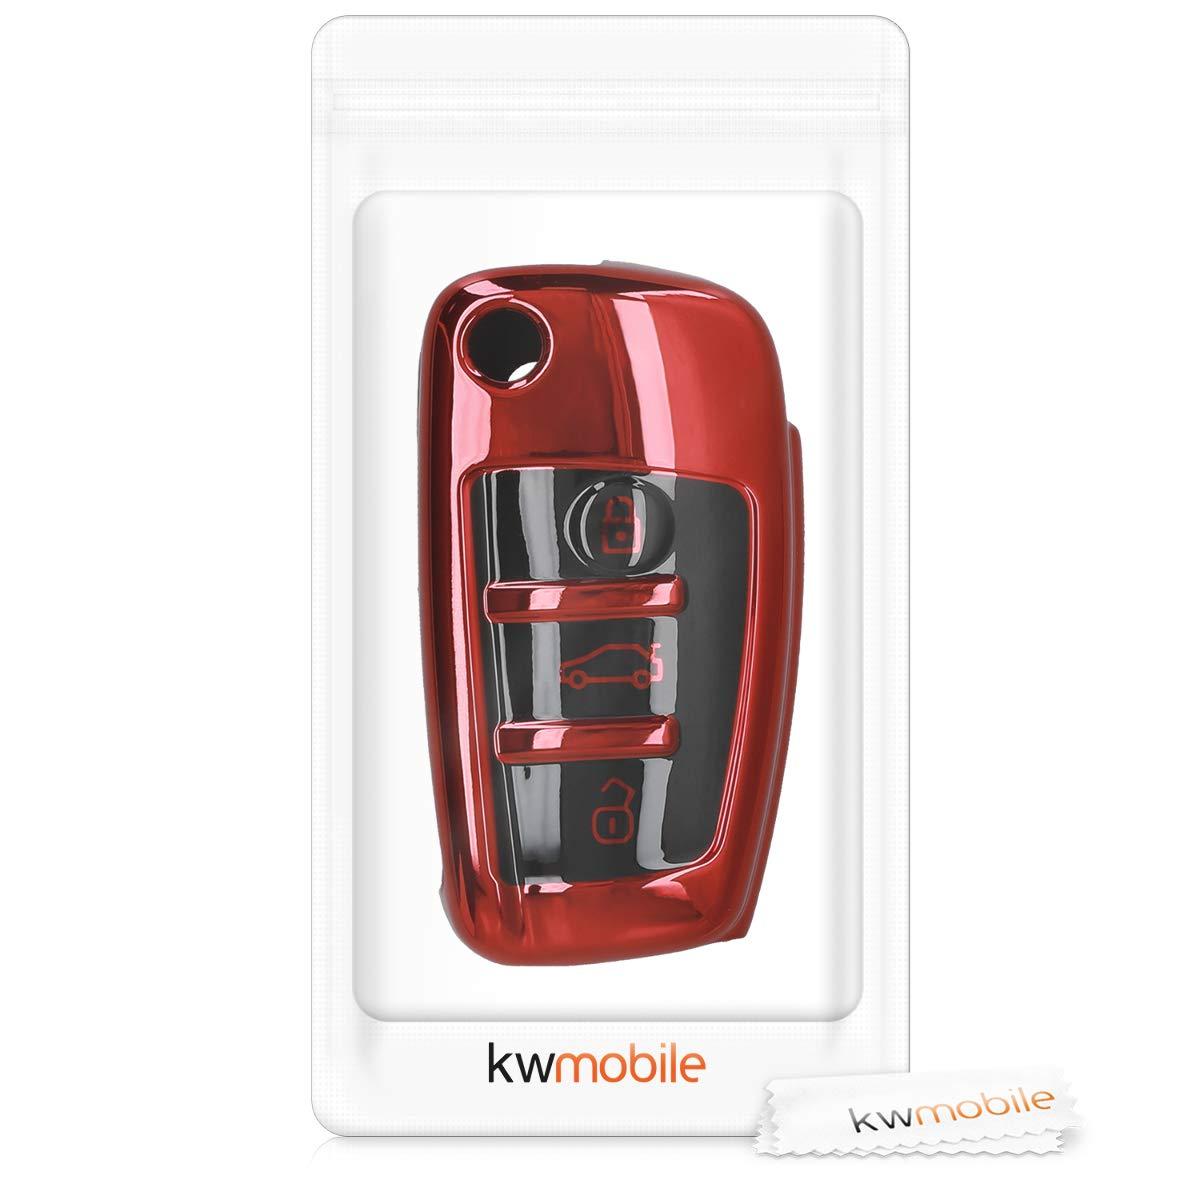 kwmobile Funda para Mando de Audi con dise/ño dise/ño de Rally Carcasa para Llave del Coche Llave Plegable de 3 Botones para Coche Audi